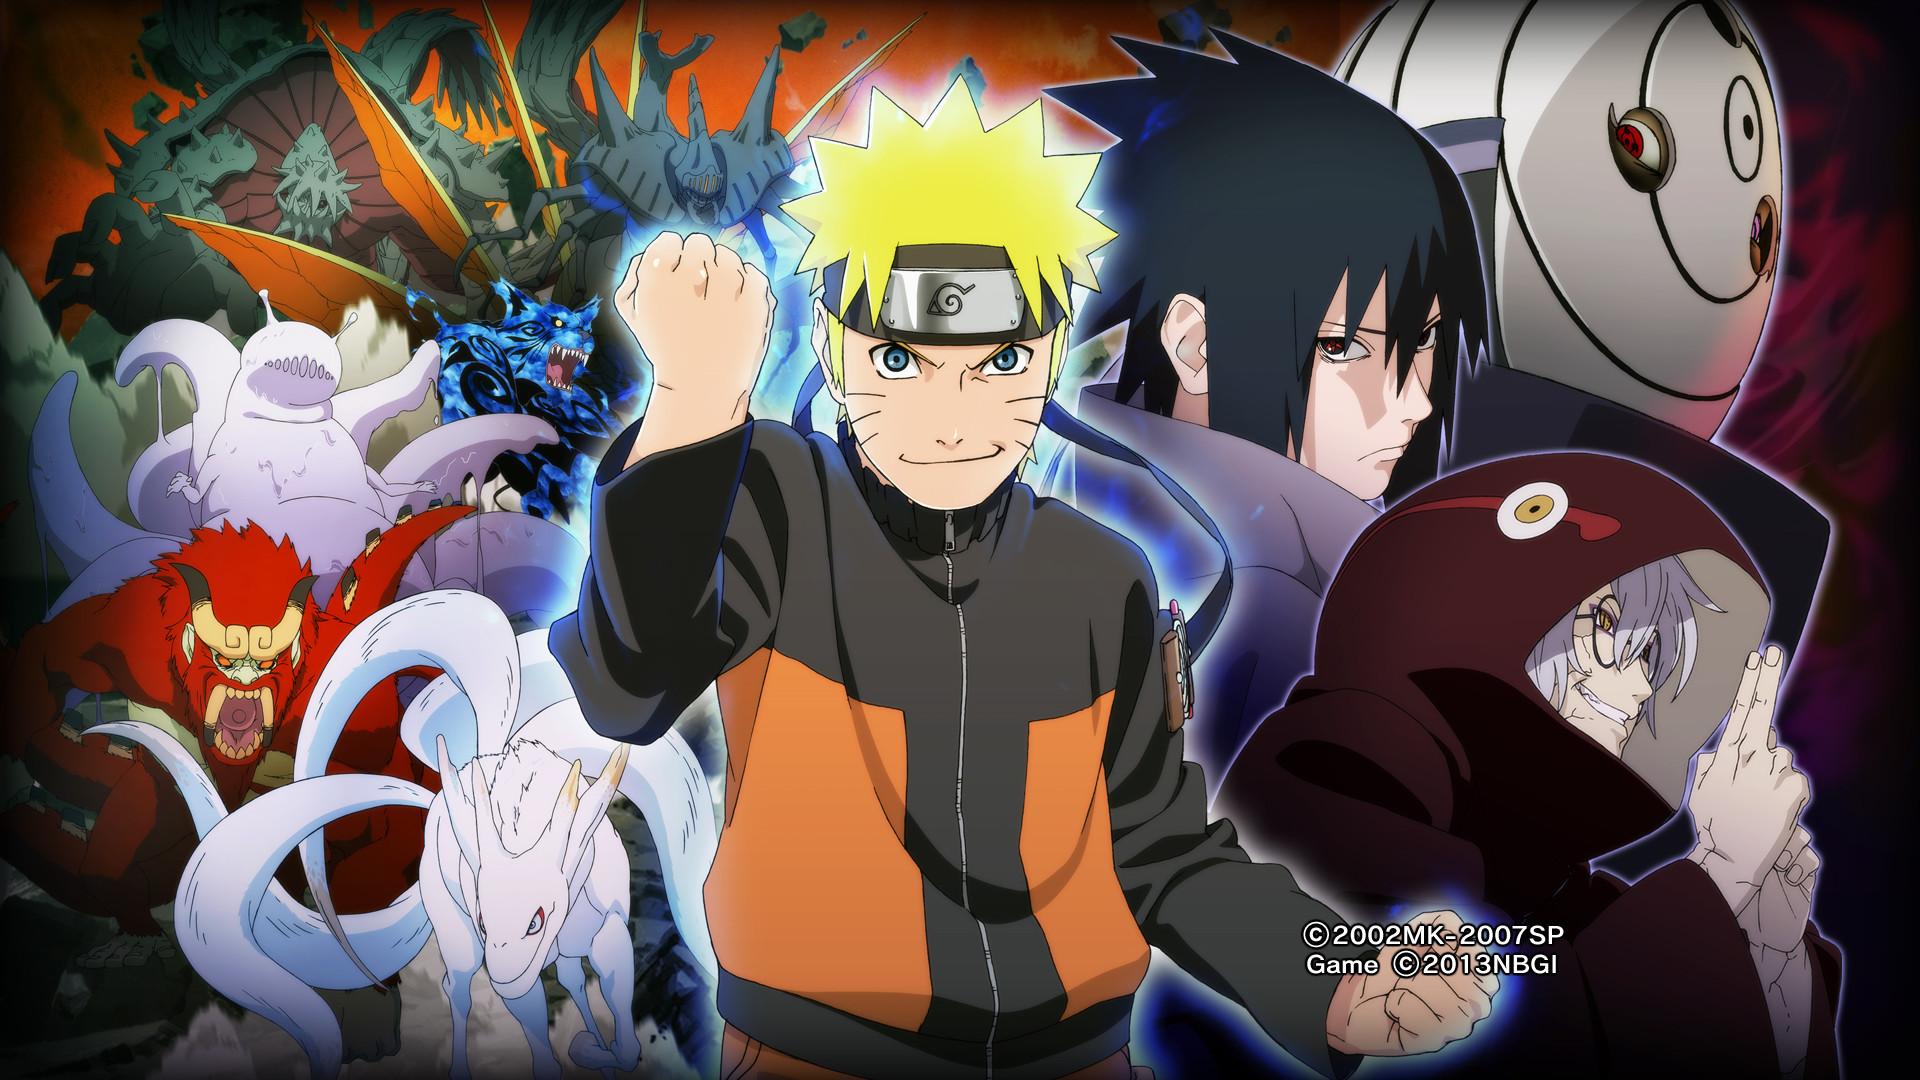 Res: 1920x1080, Naruto Wallpaper by zerogravity411 Naruto Wallpaper by zerogravity411